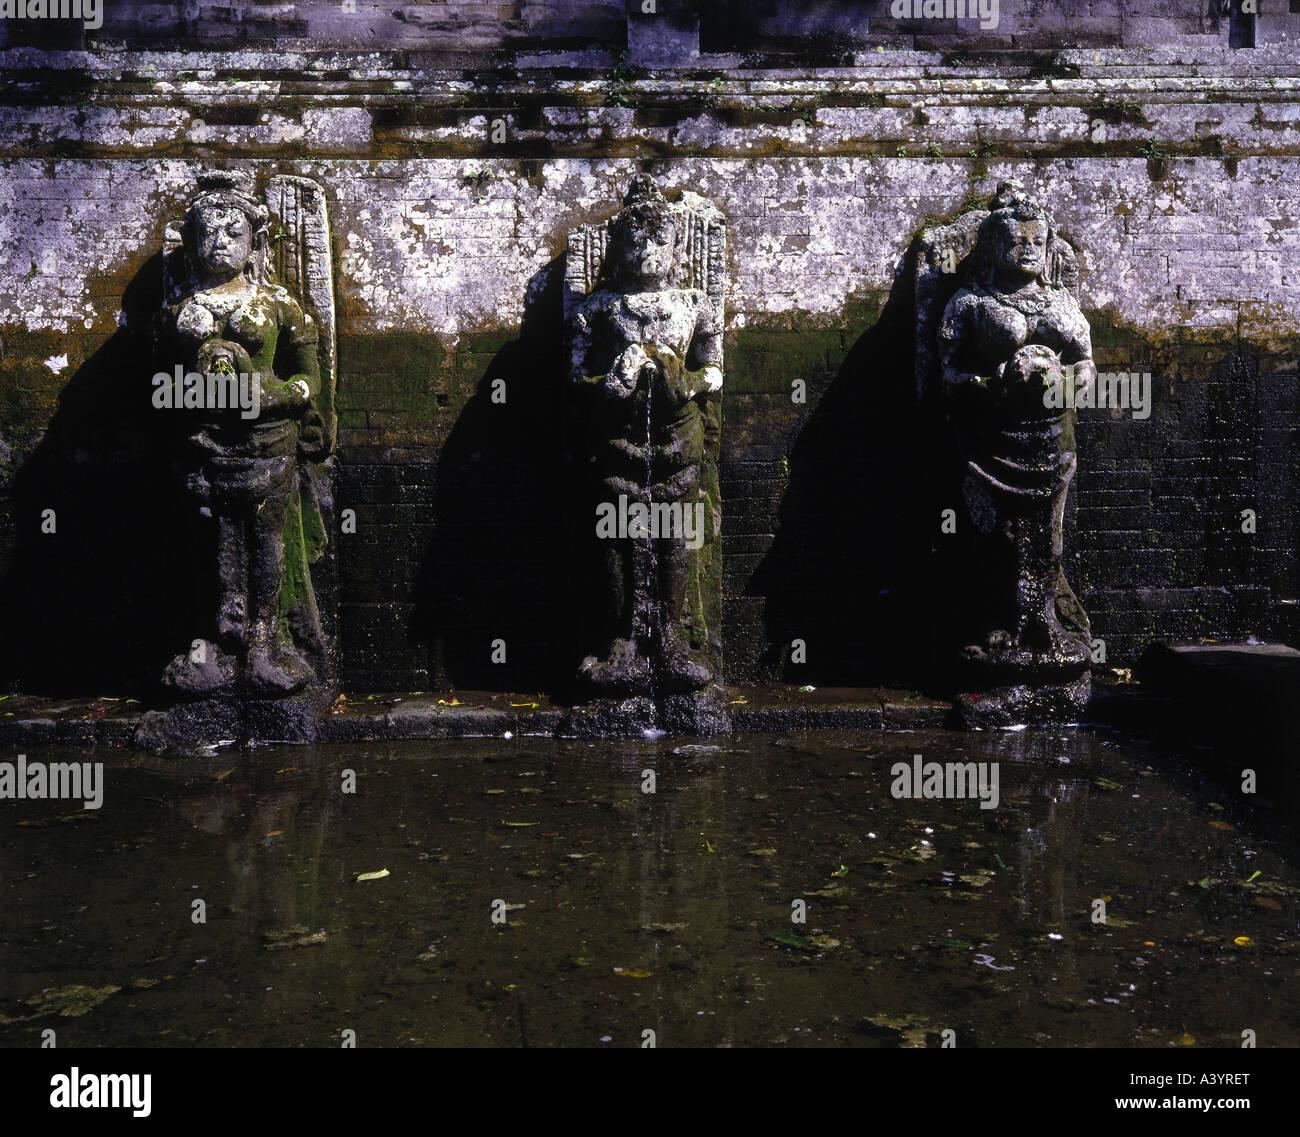 Viaje / Geografía, Indonesia, Bali, edificios, Goa Gajah, bañarse spot, ganga figuras, del siglo XI, , Imagen De Stock